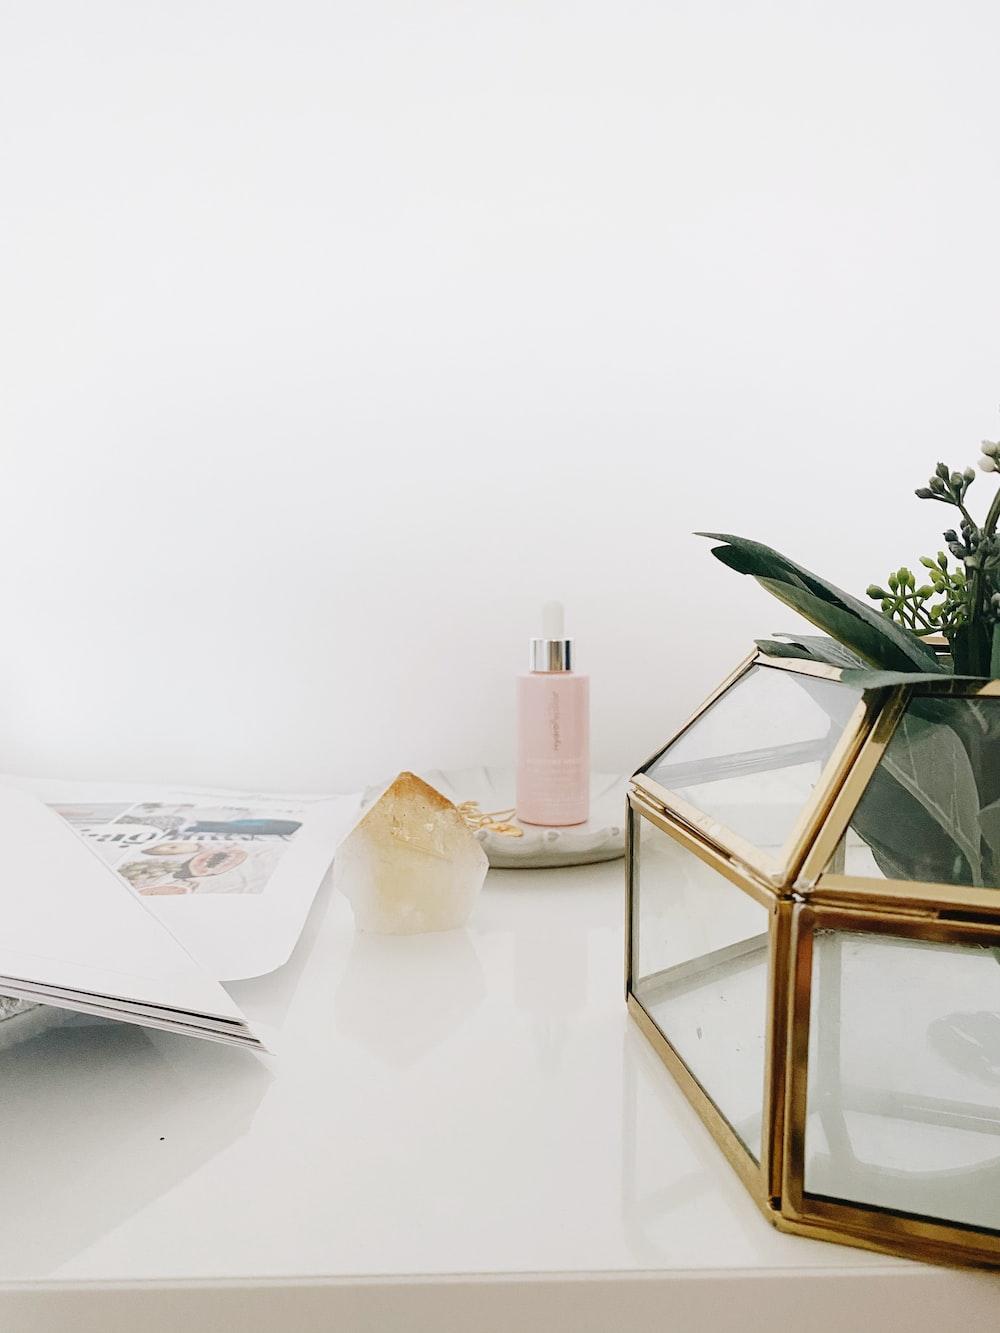 gold framed mirror on white table